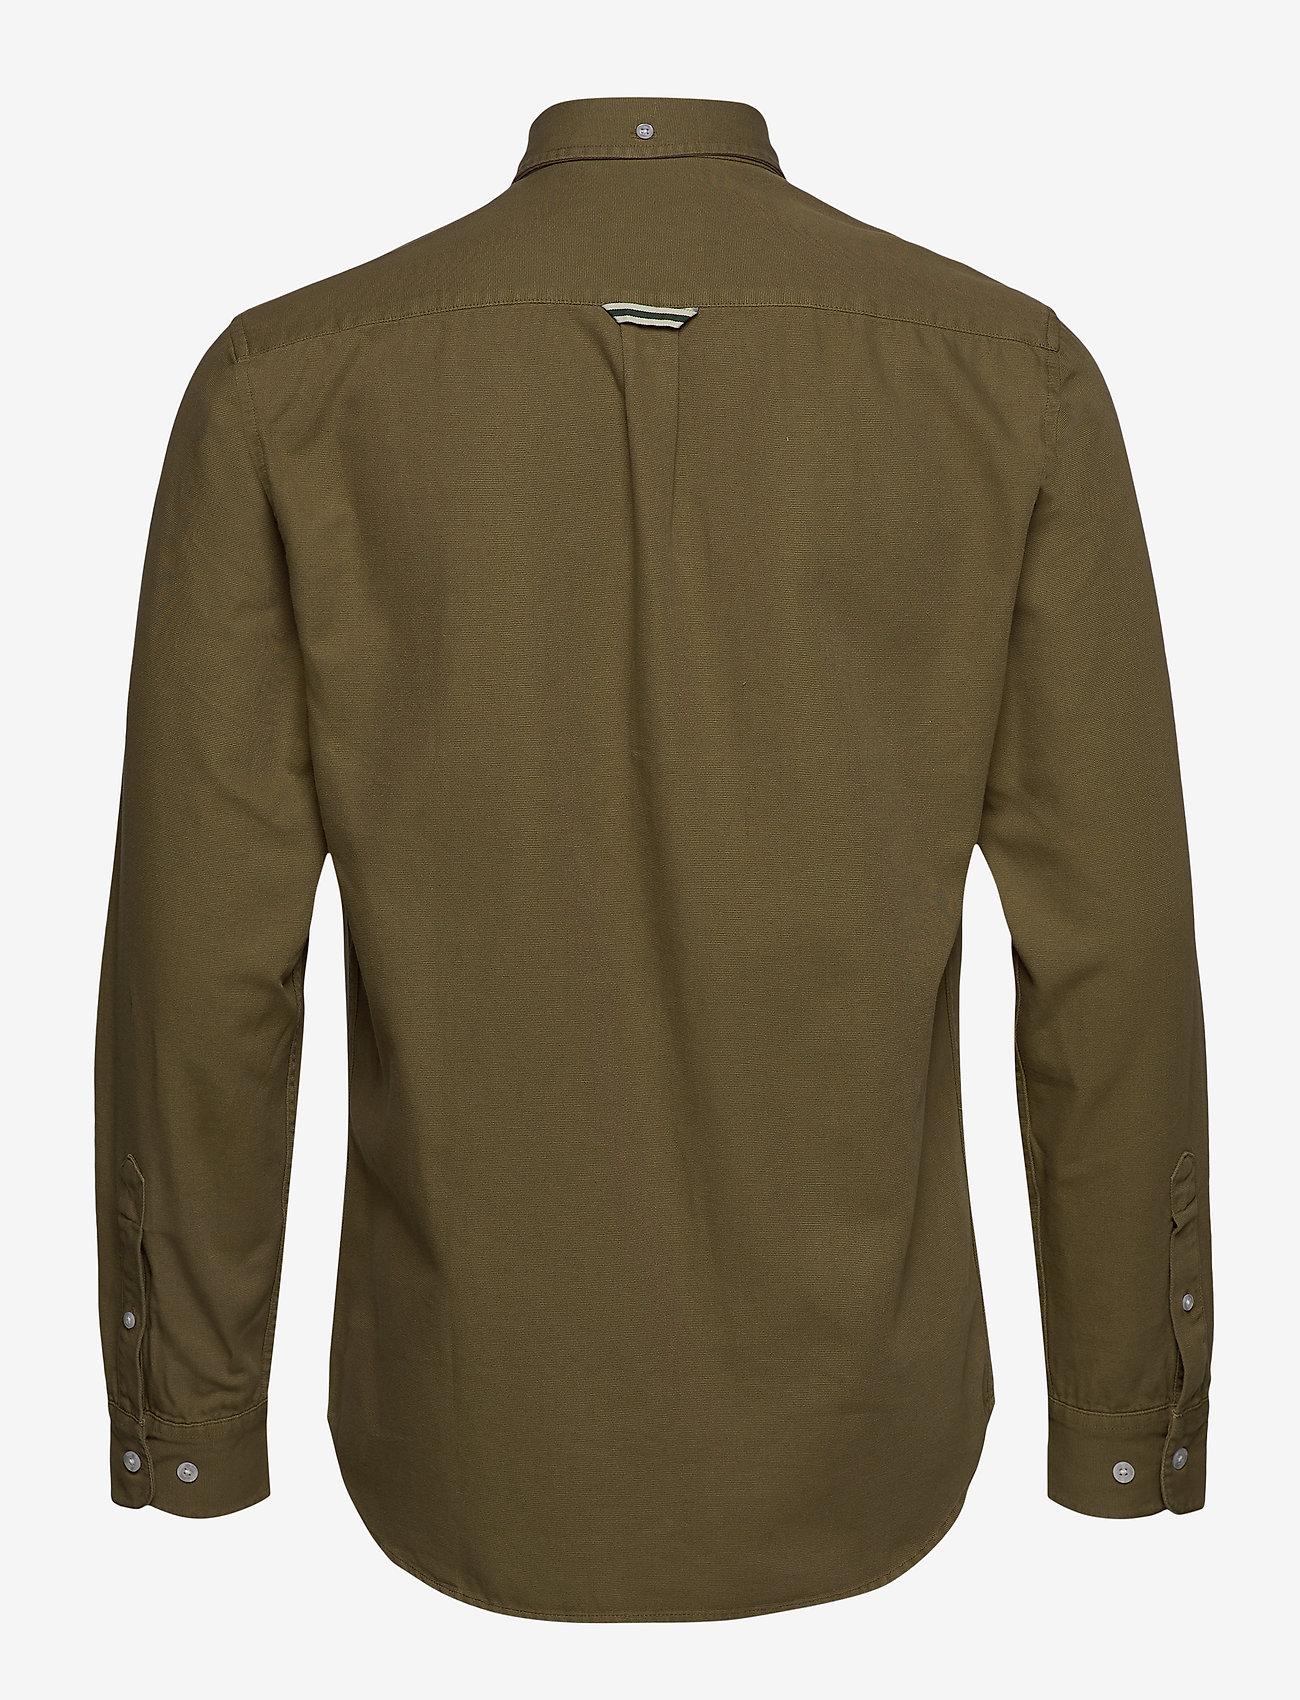 Forét - BEAR SHIRT - overshirts - olive - 1